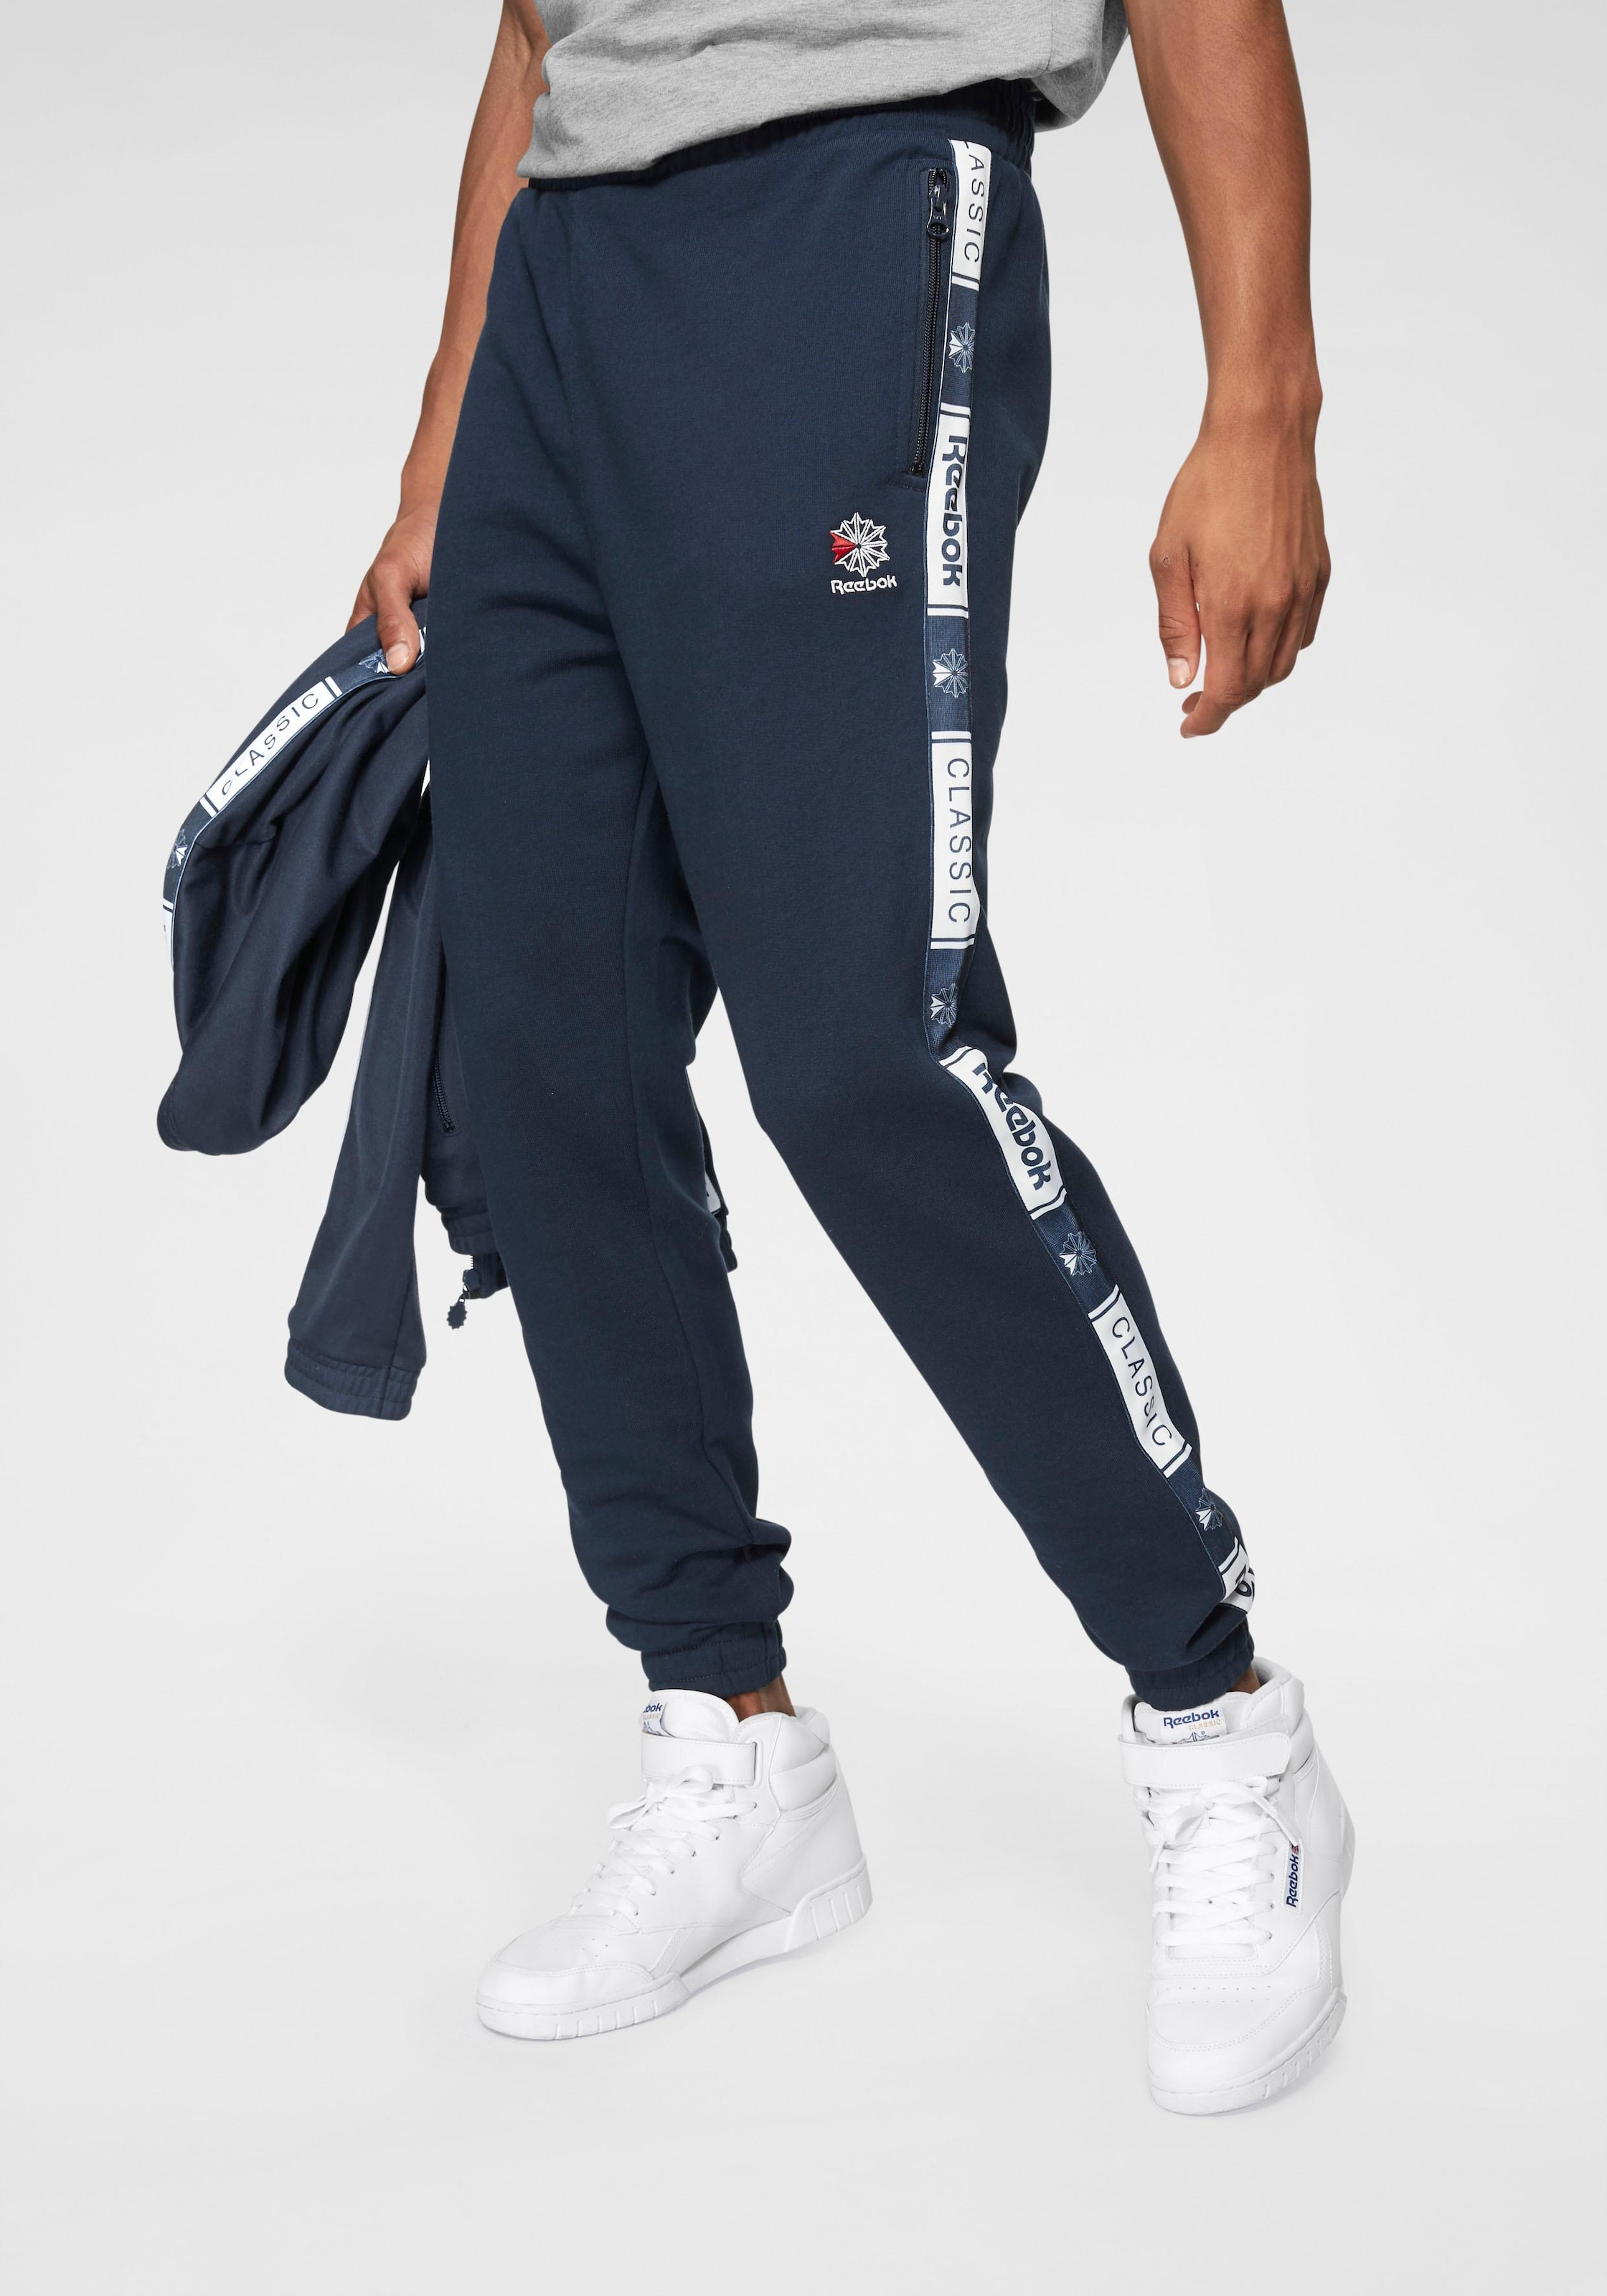 Reebok Classic Jogginghose »FT DIS PANT« ▷ kaufen   BAUR